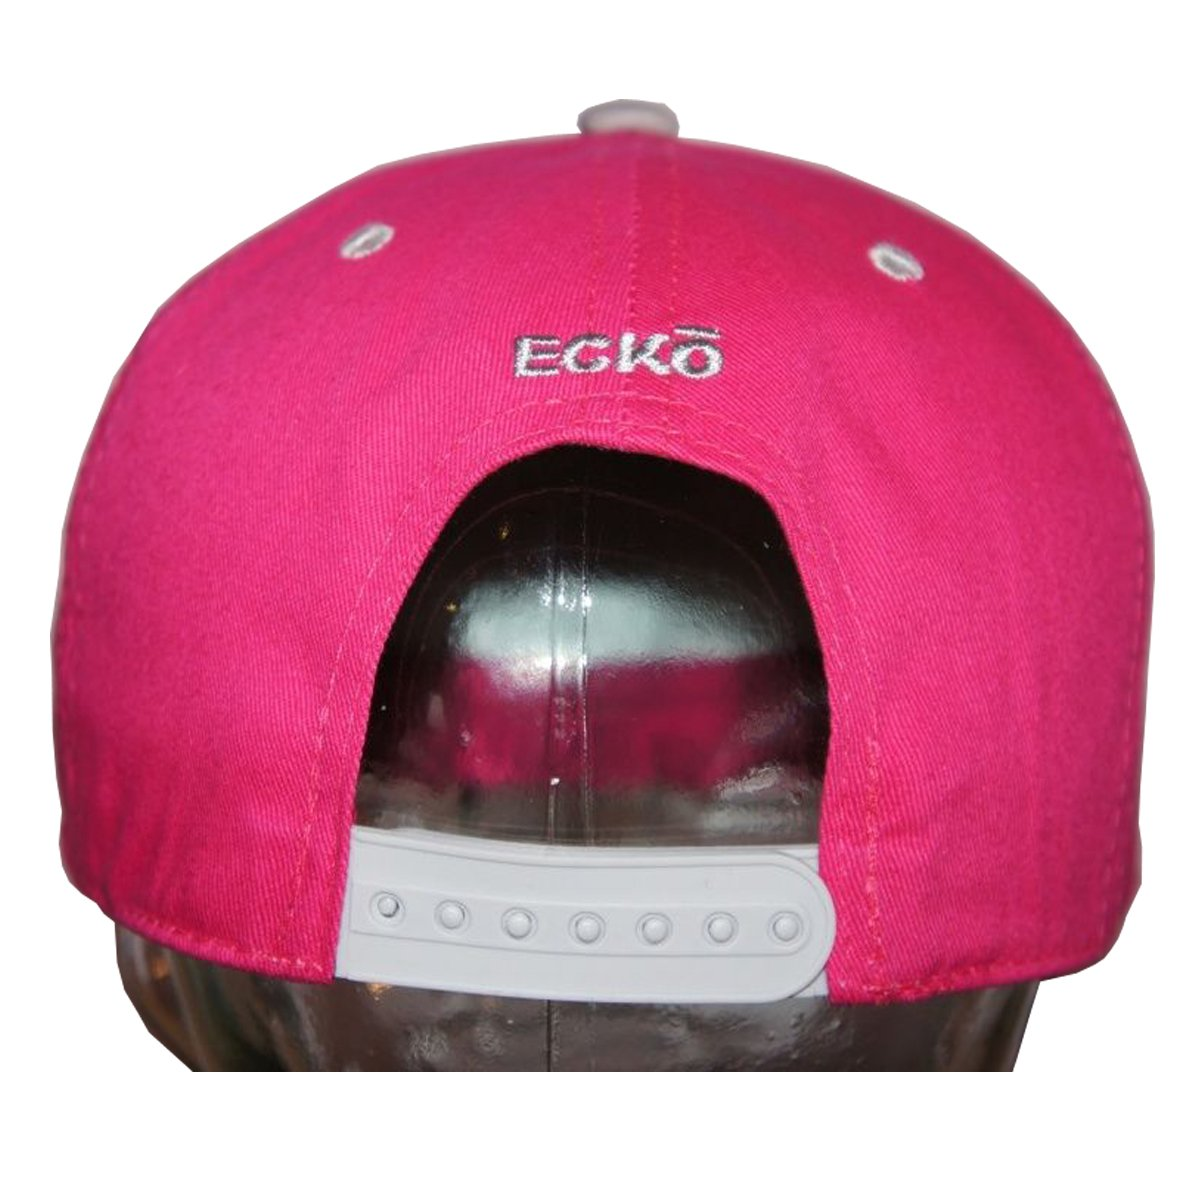 Ecko Unlimited 1972 Gorras de béisbol Unisex, Estilo Retro ...